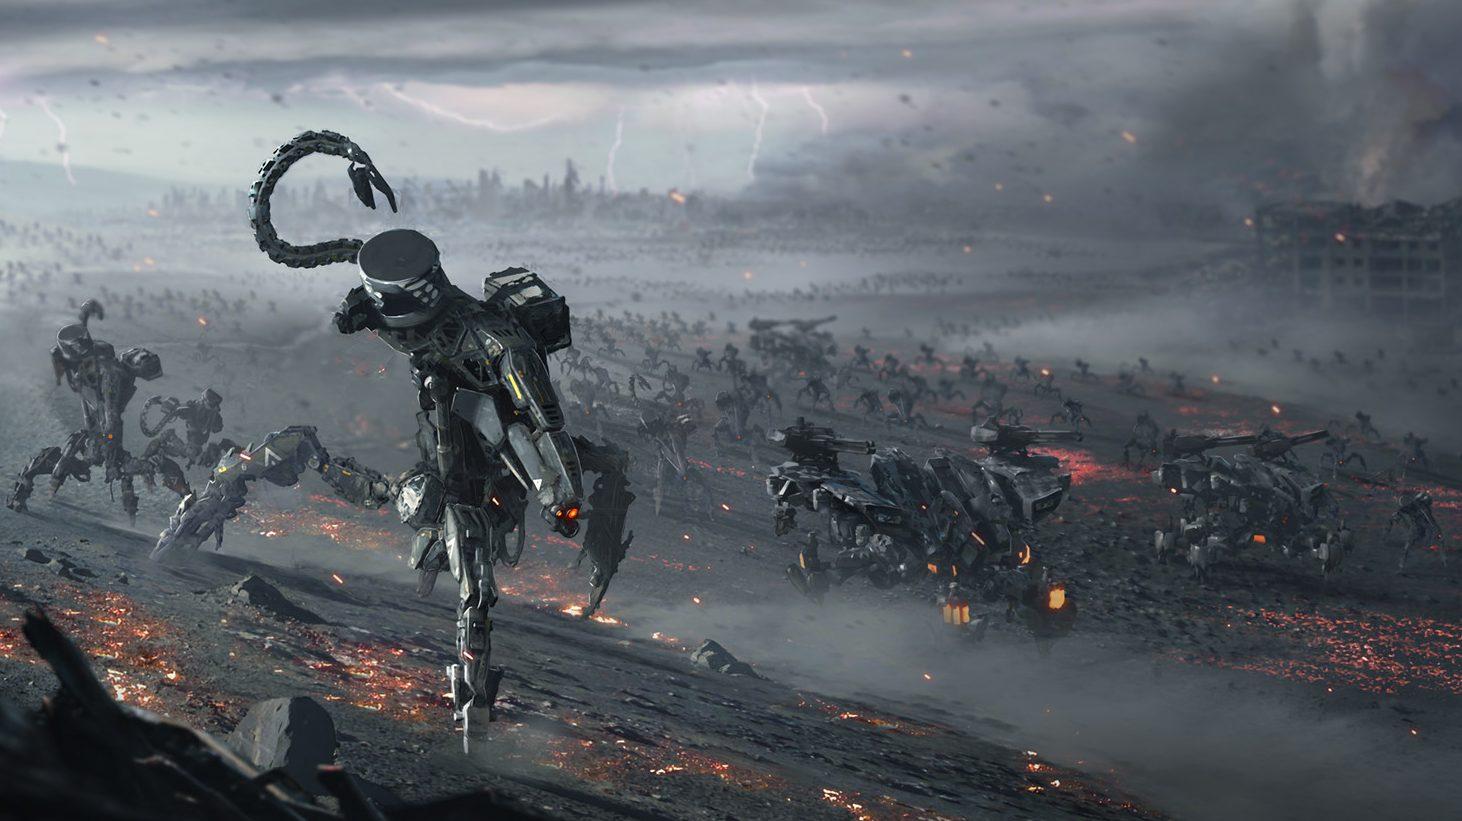 Apocalypse by Eric Felten